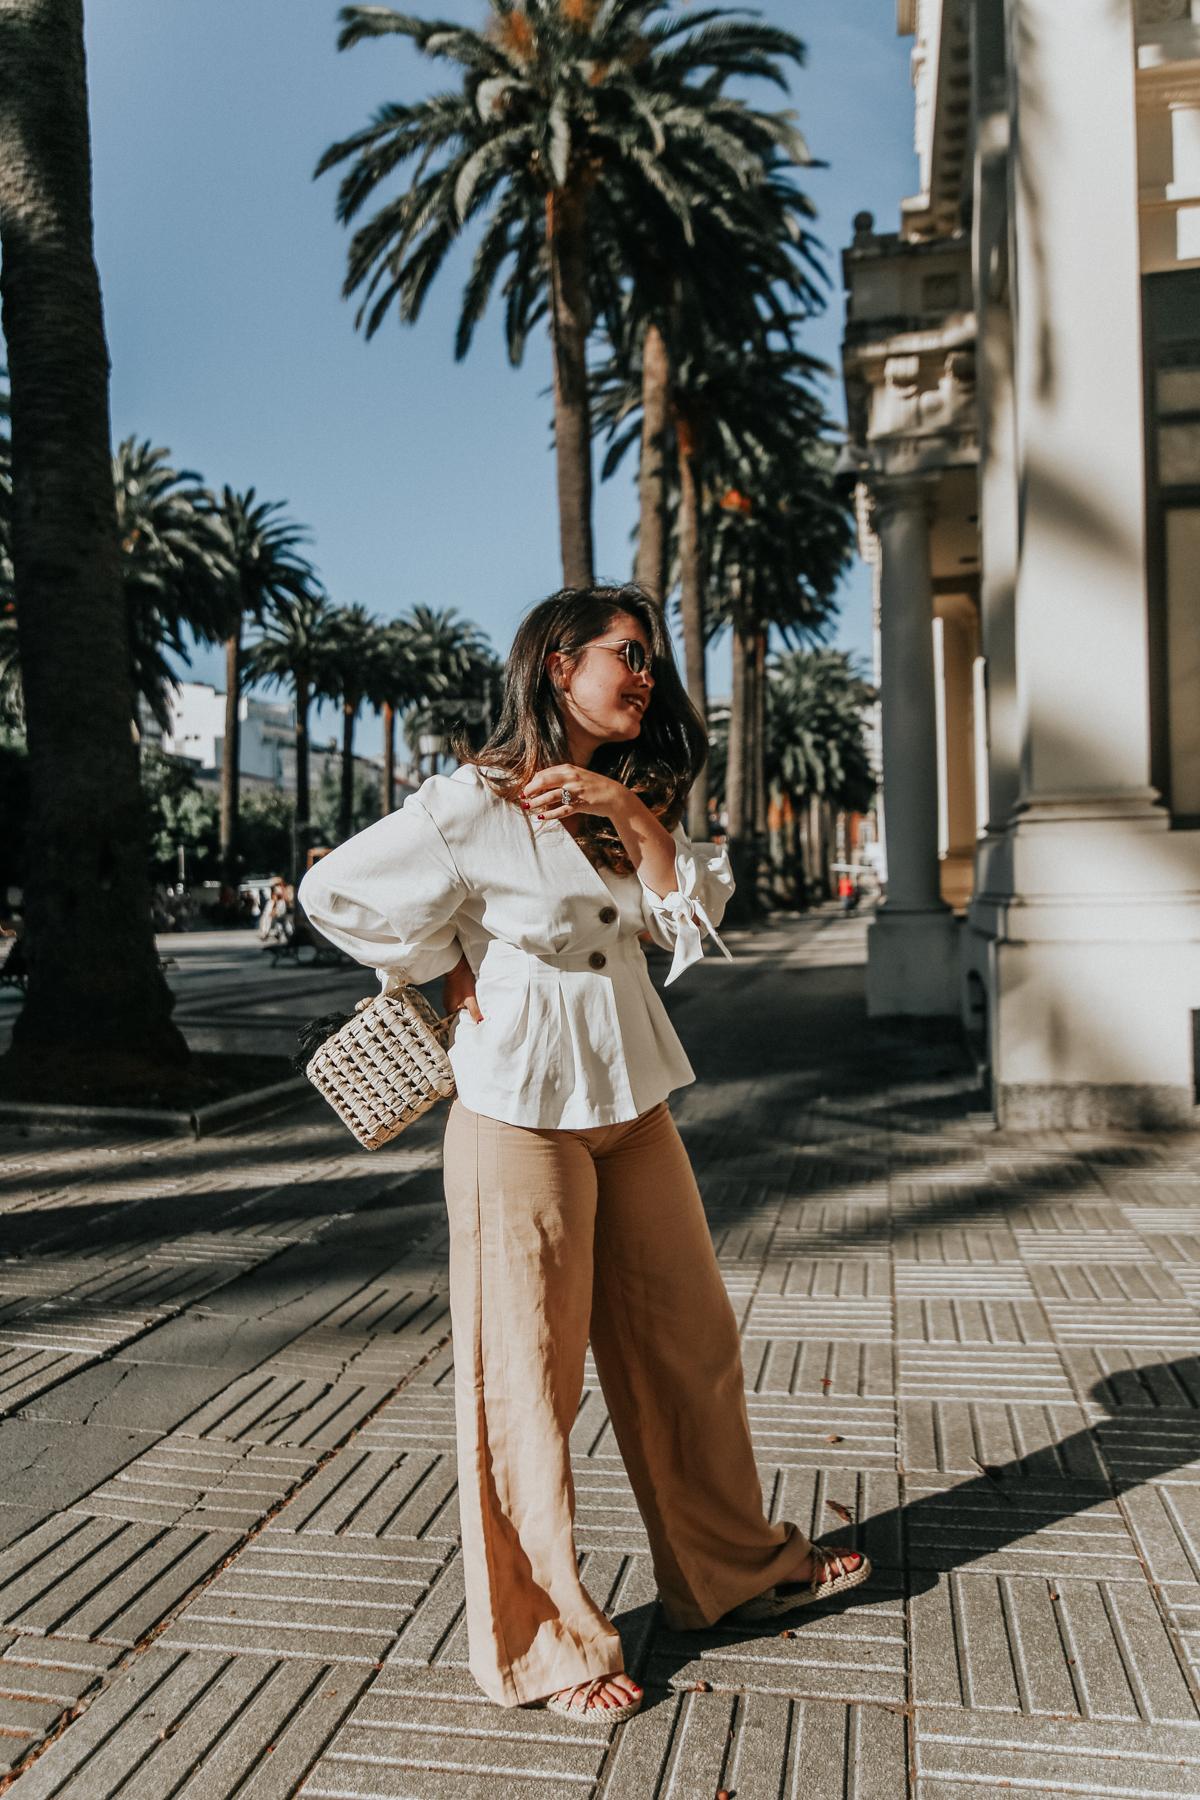 pantalones-de-lino-tiro-alto-tendencia-look